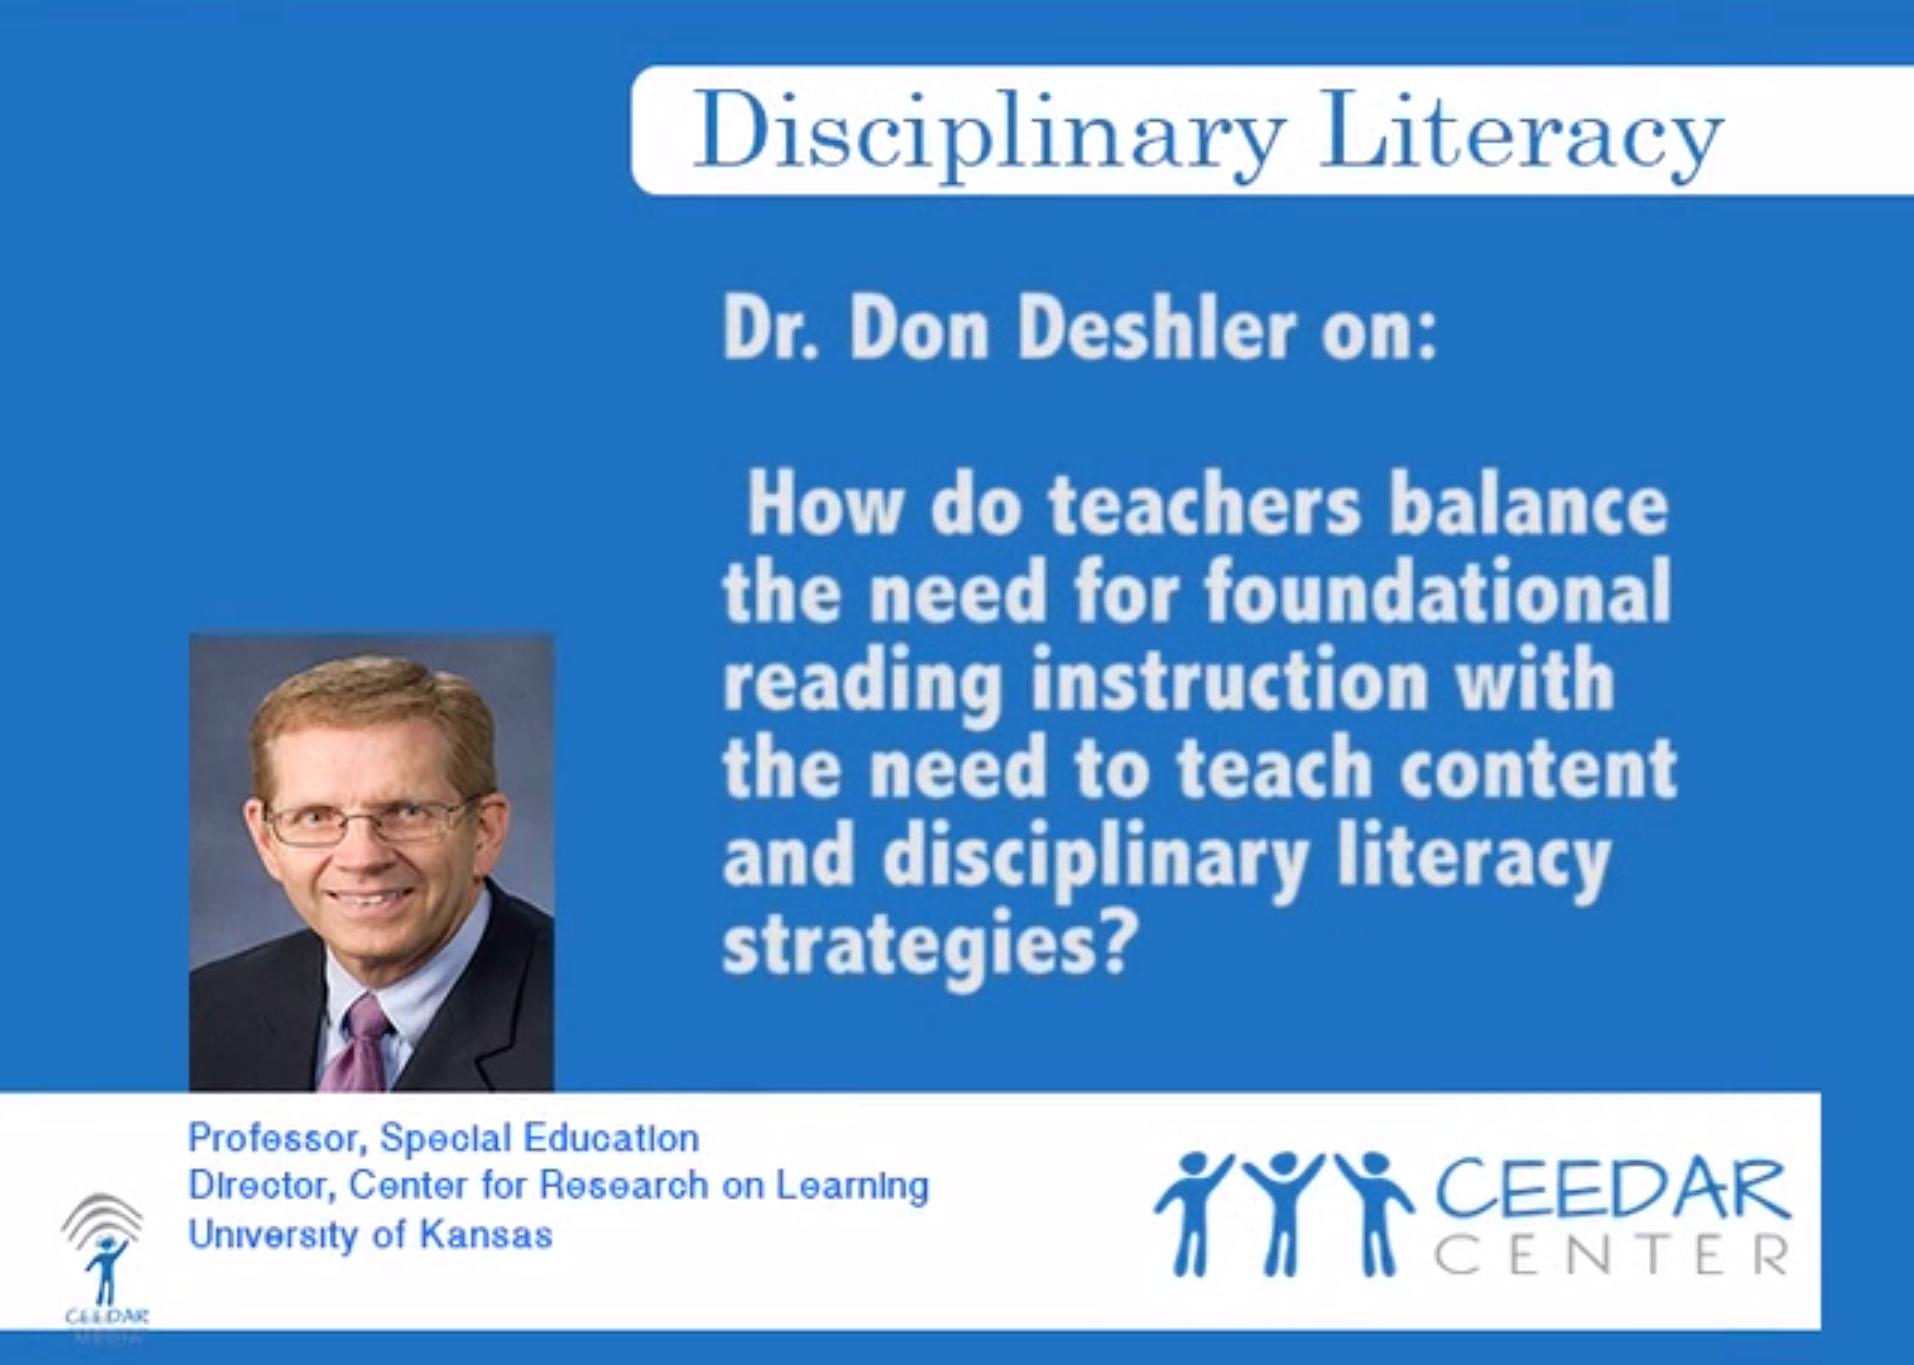 Dr. Don Deshler on Disciplinary Literacy Strategies